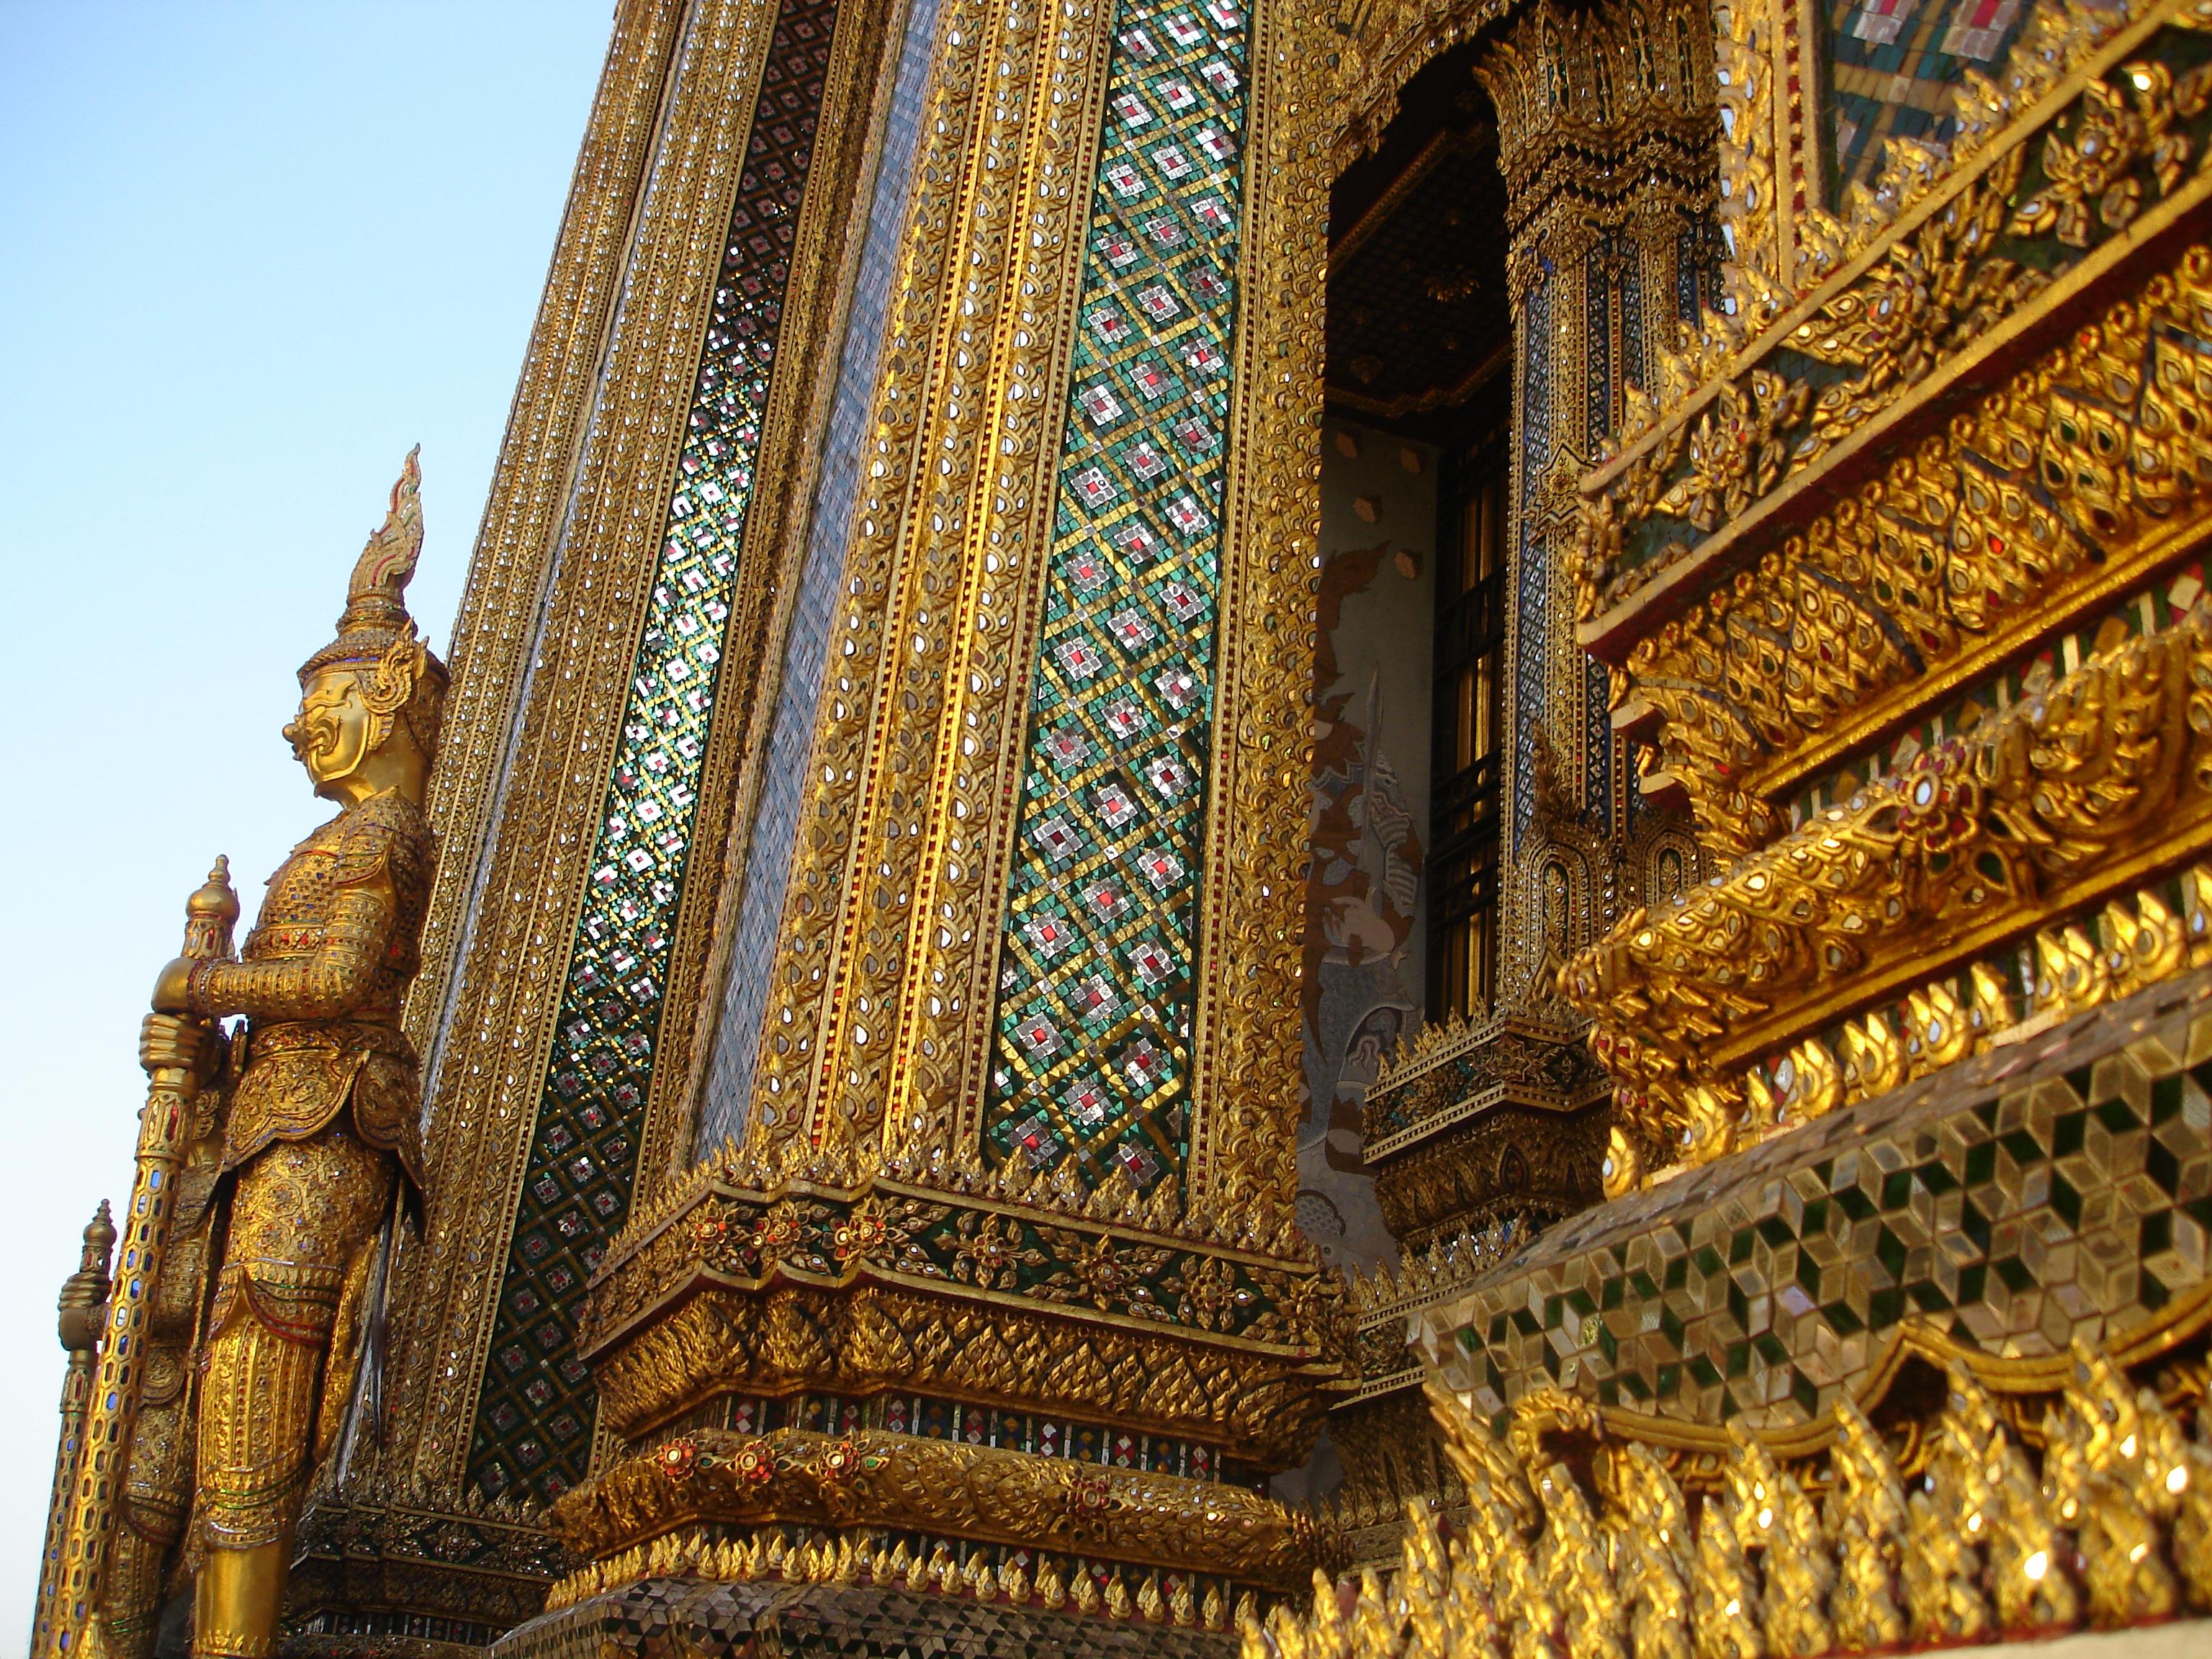 Grand Palace in Bangkok. Photo taken by Mark Jochim on January 8, 2006.